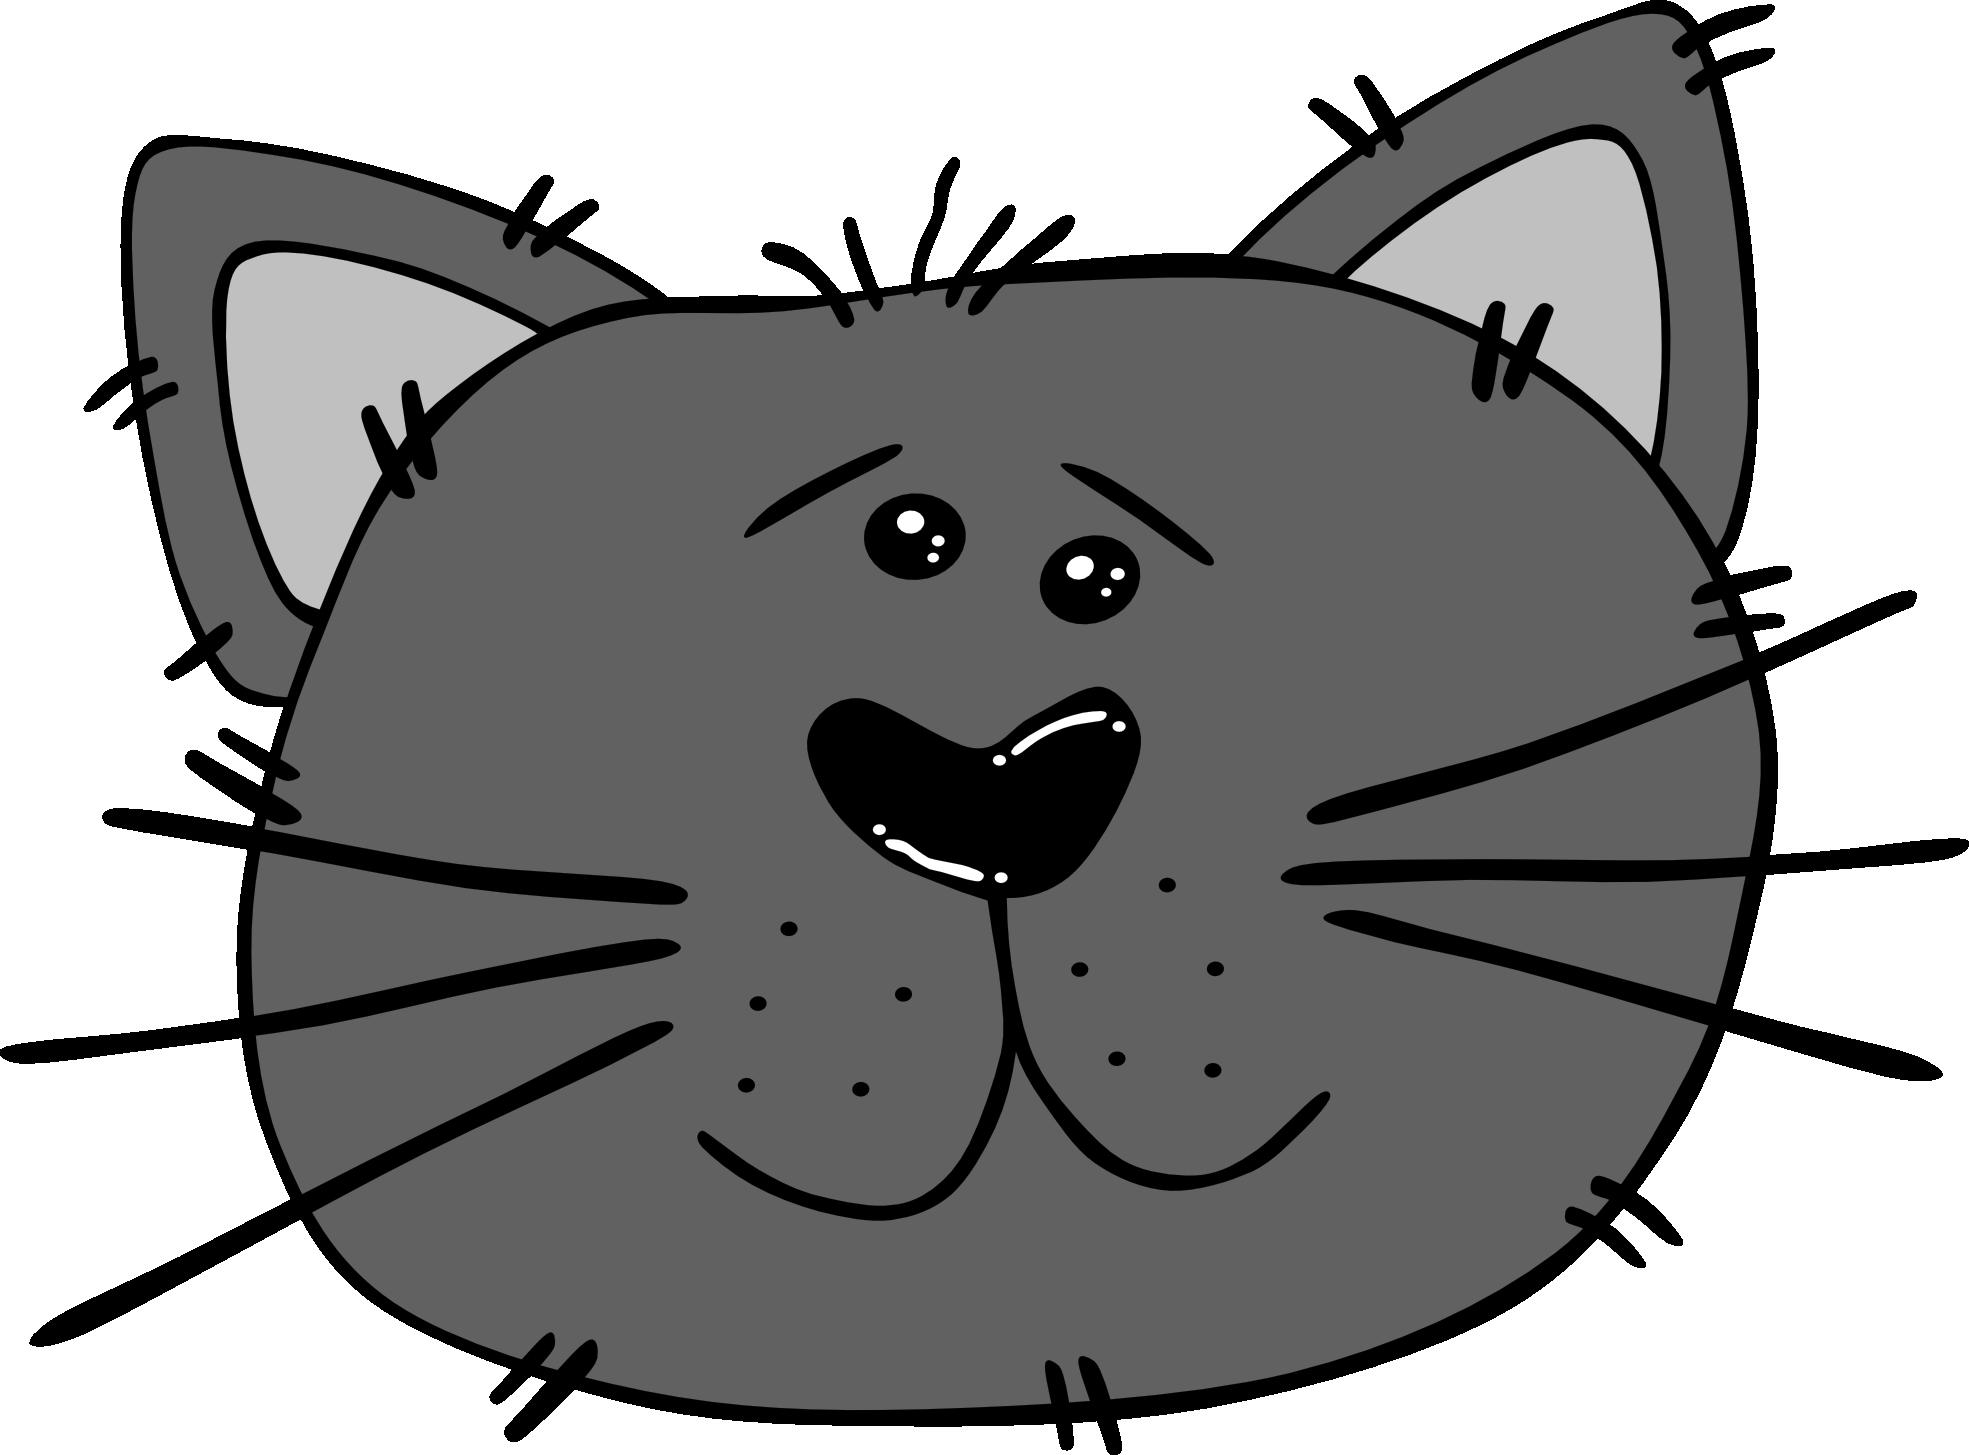 Line Drawing Of Cat Face : Cartoon cat face black white line art svg clipart best